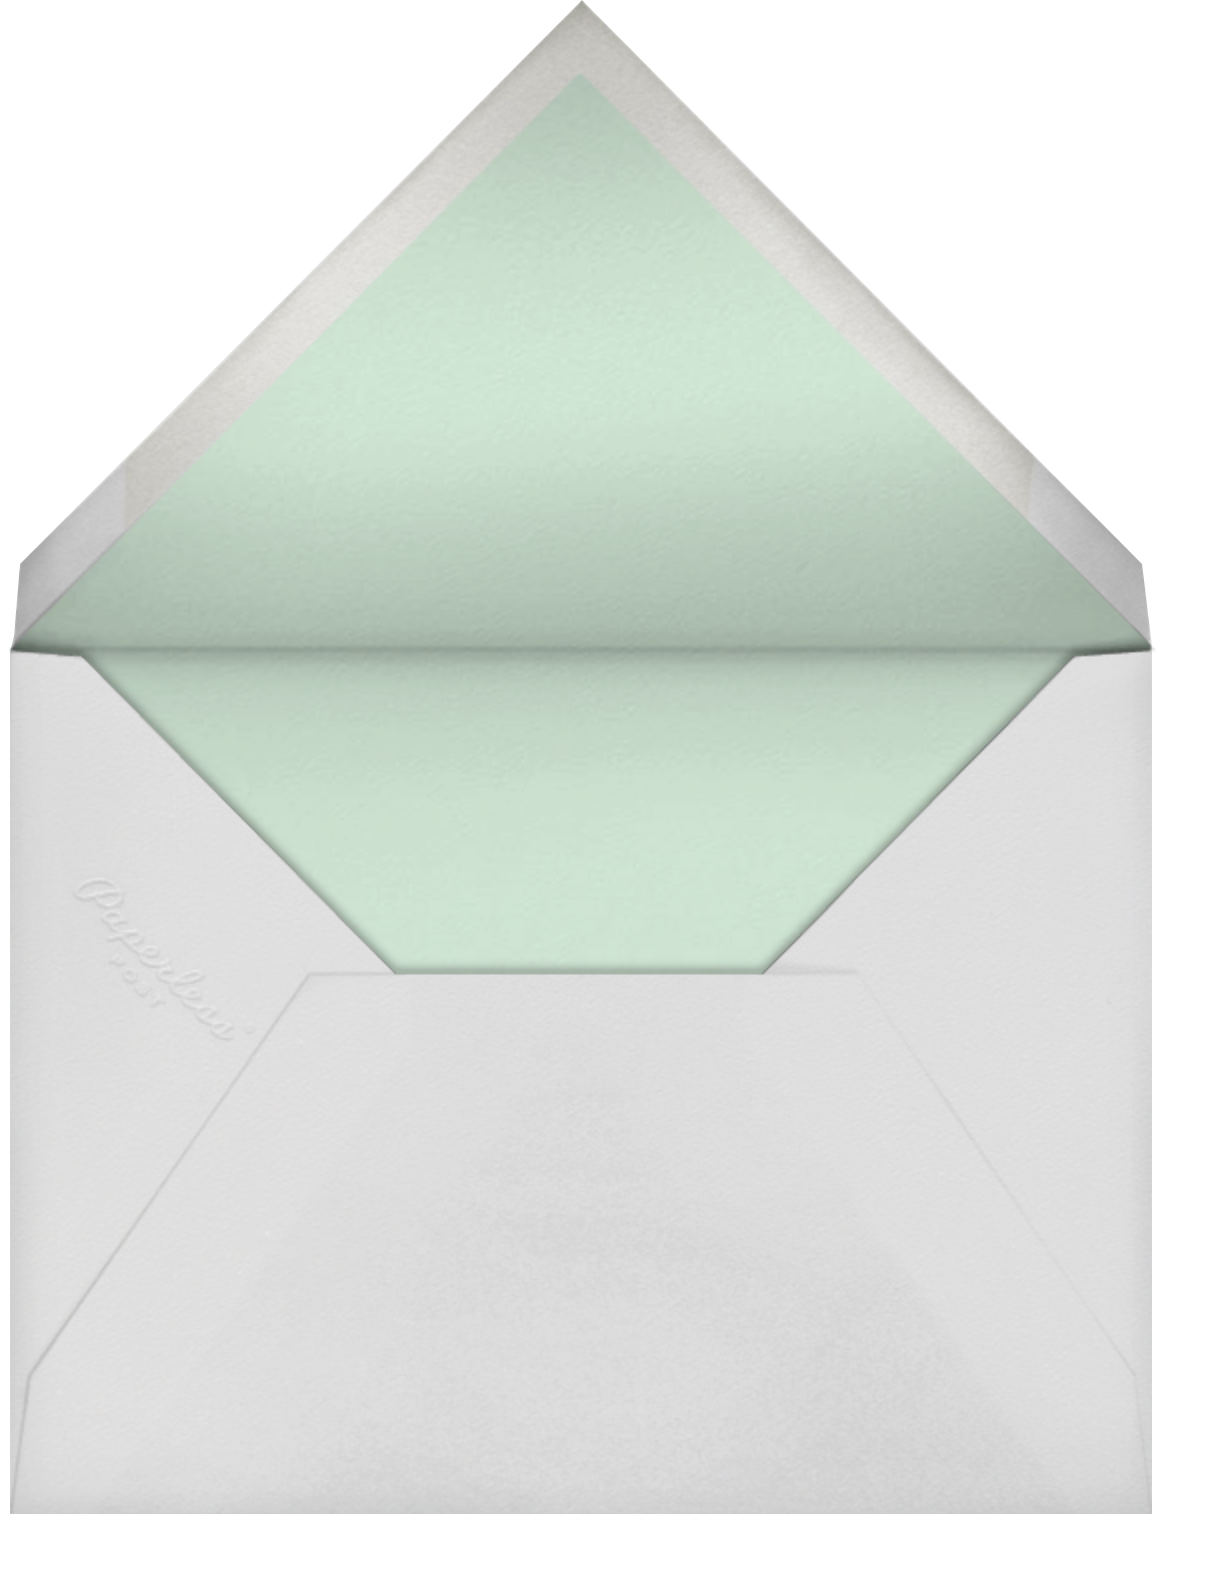 Daisy Love - Mint - Meri Meri - Envelope